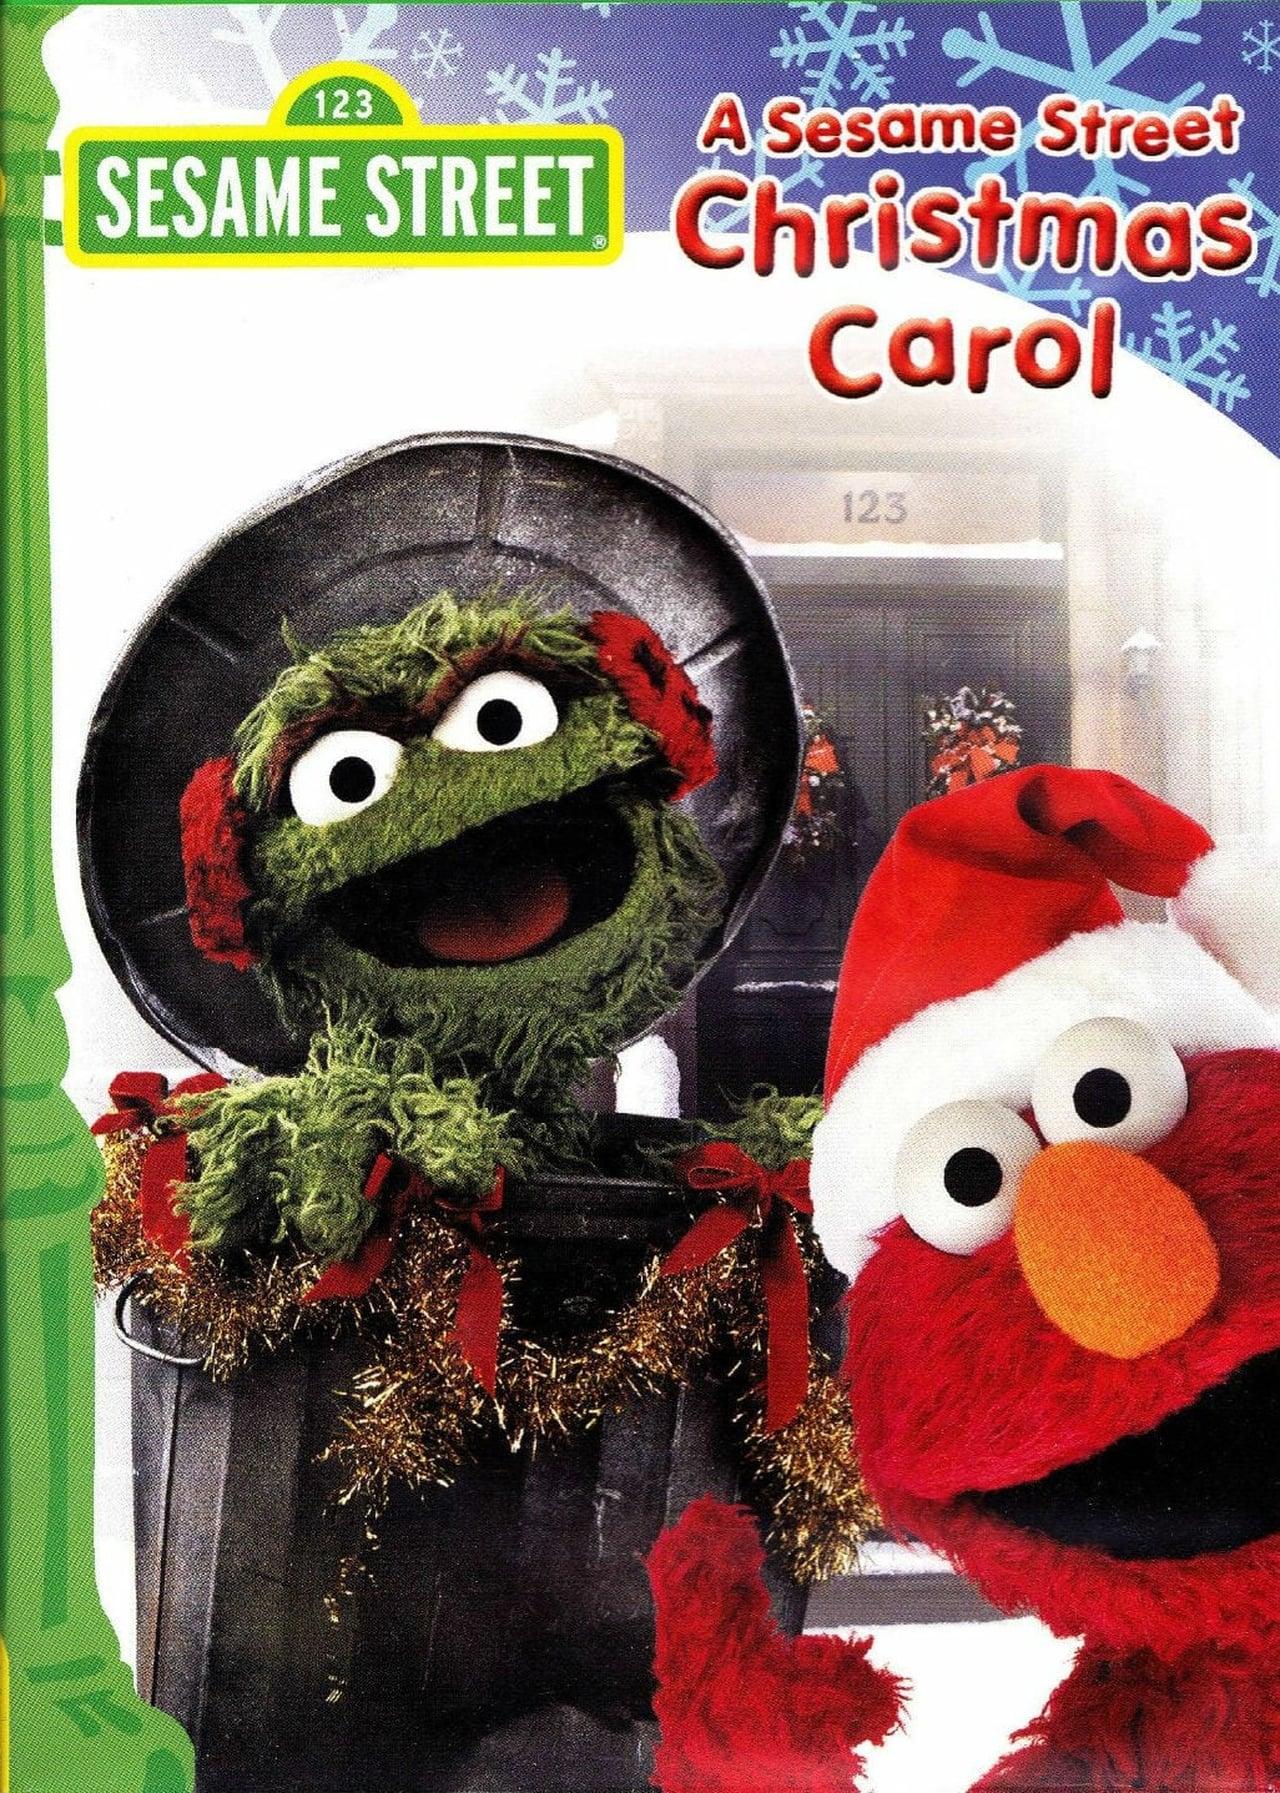 A Sesame Street Christmas Carol